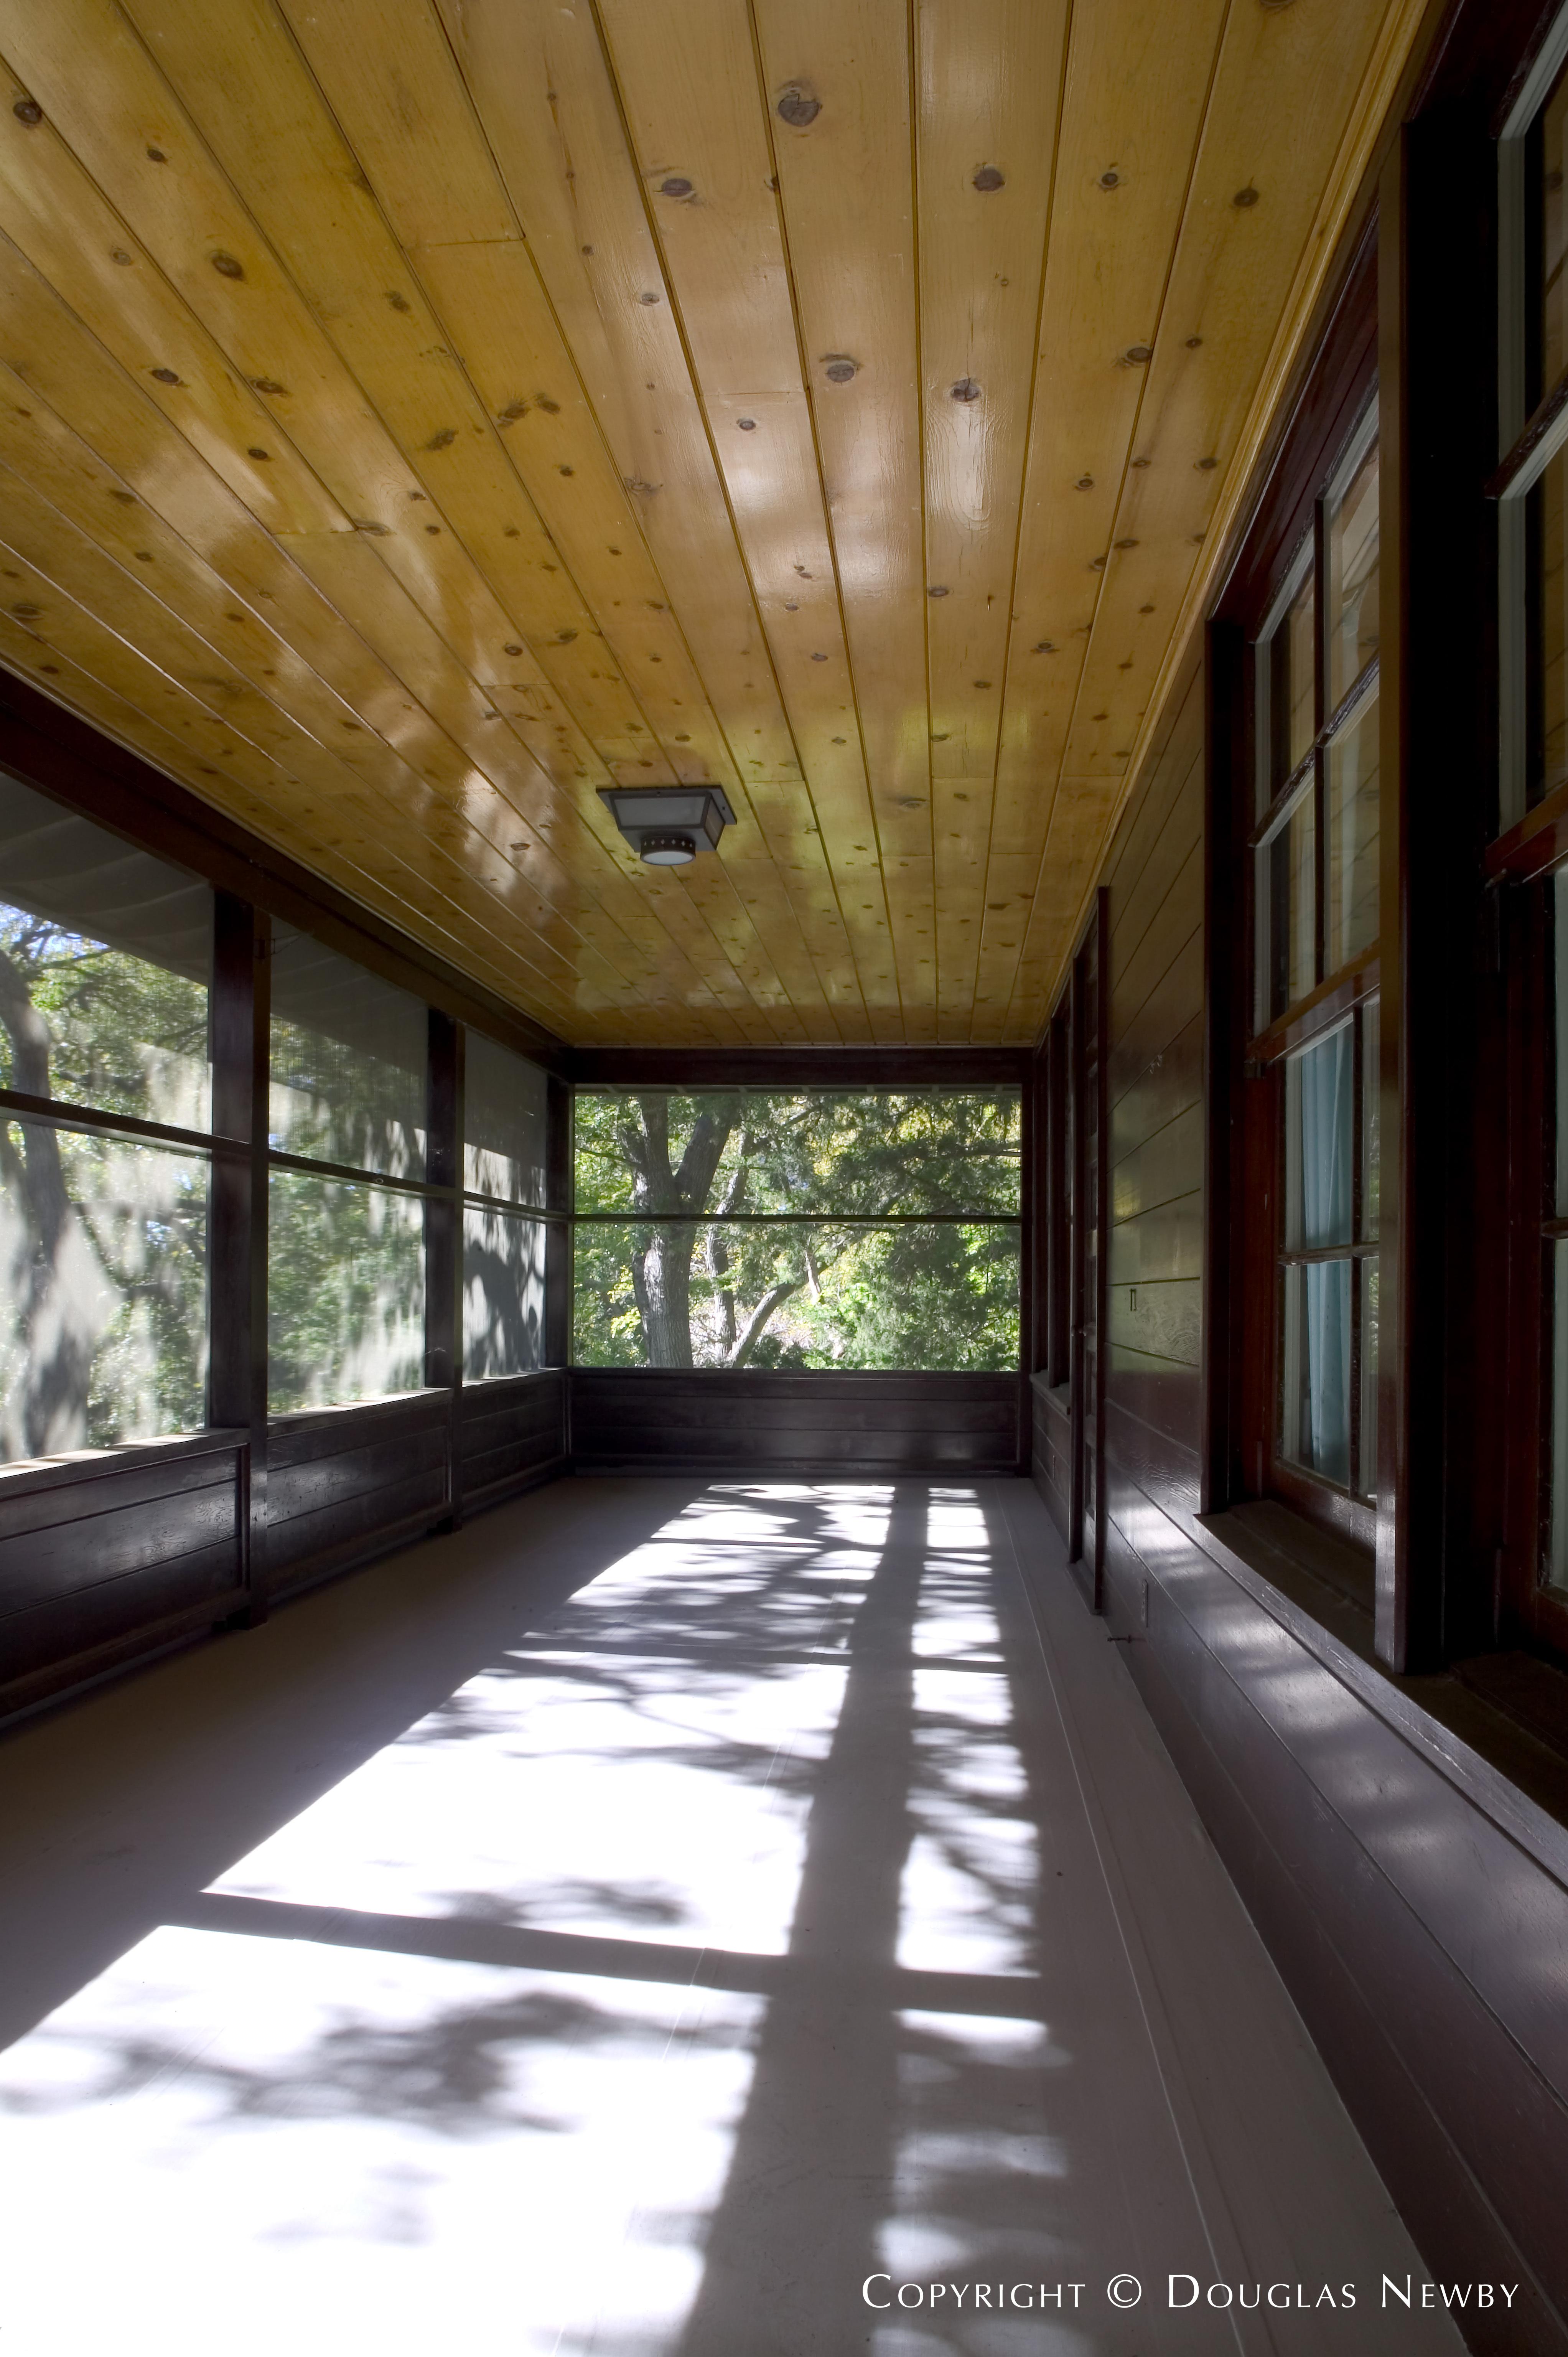 Turtle Creek Corridor Modern Home sitting on 0.633 Acres